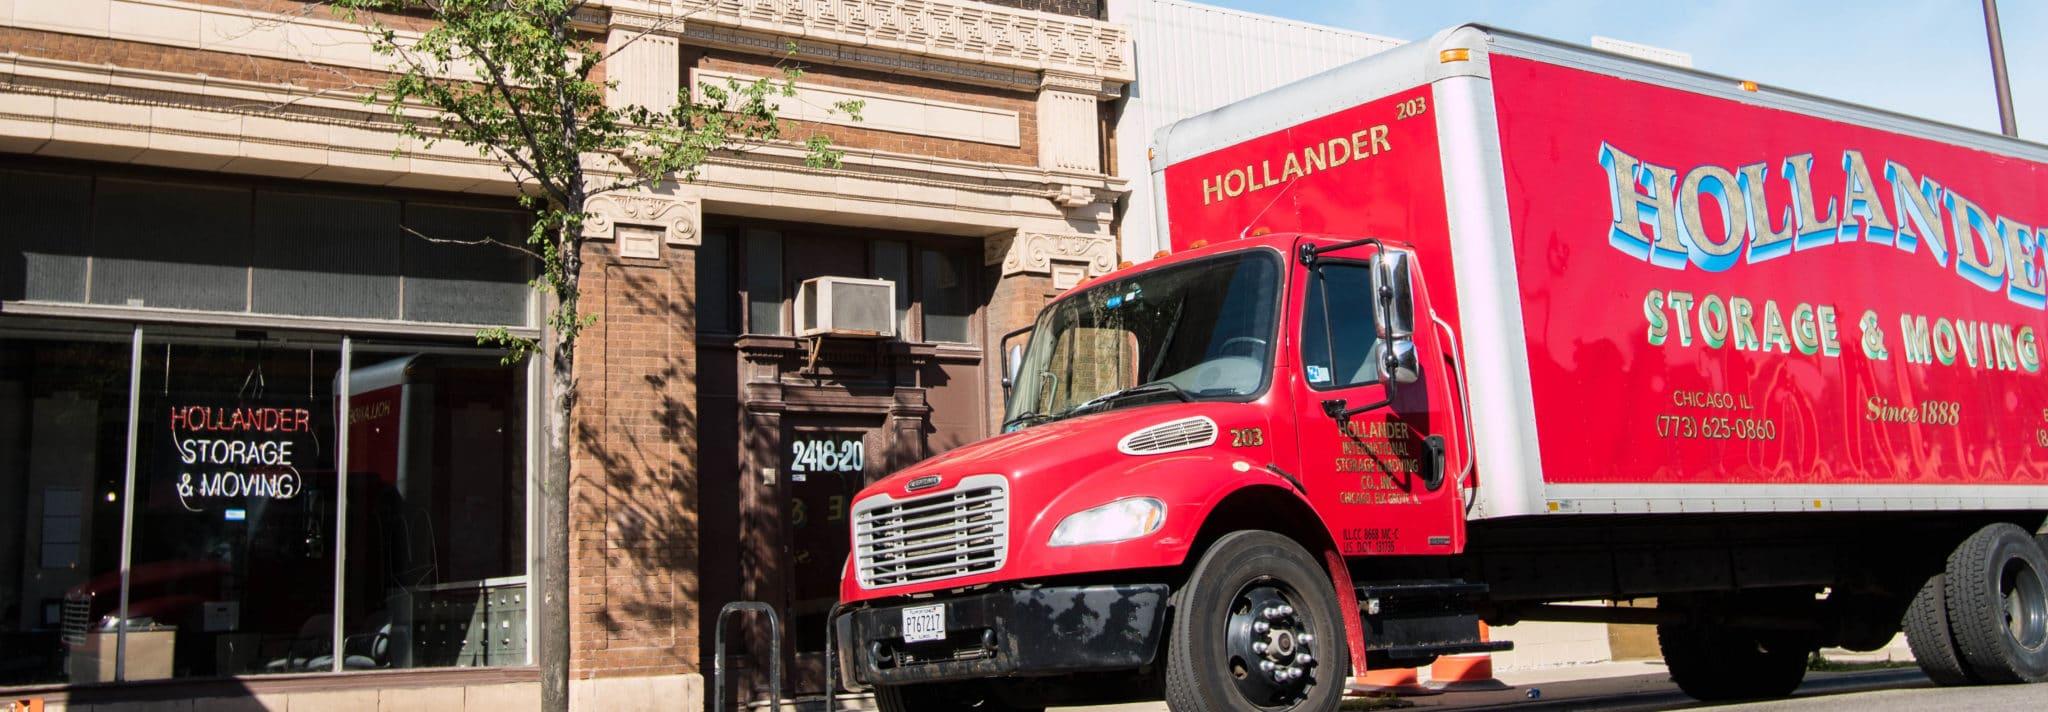 Hollander truck in front of the Hollander building